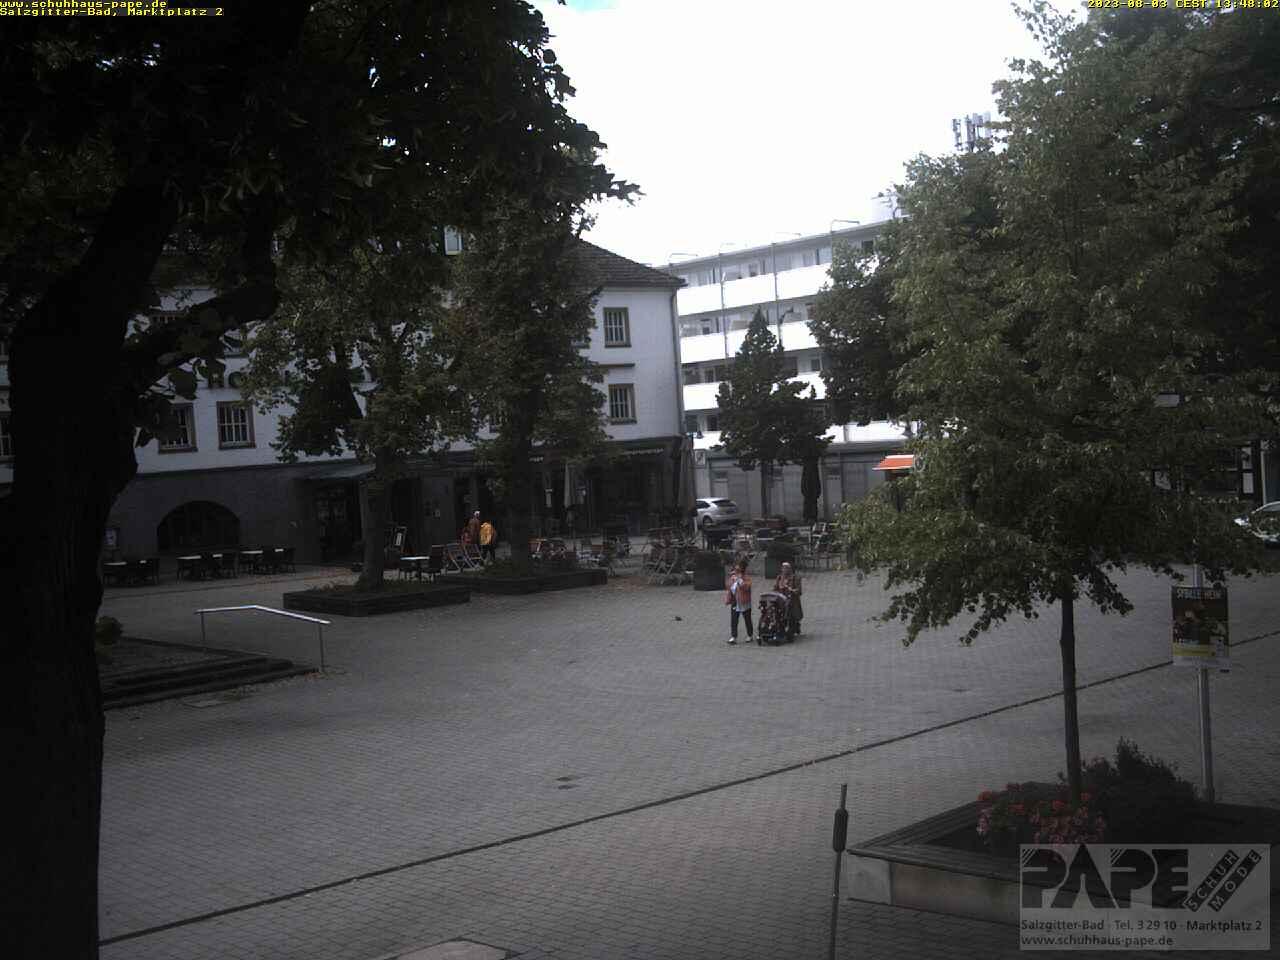 salzgitter marktplatz salzgitter bad webcam galore. Black Bedroom Furniture Sets. Home Design Ideas